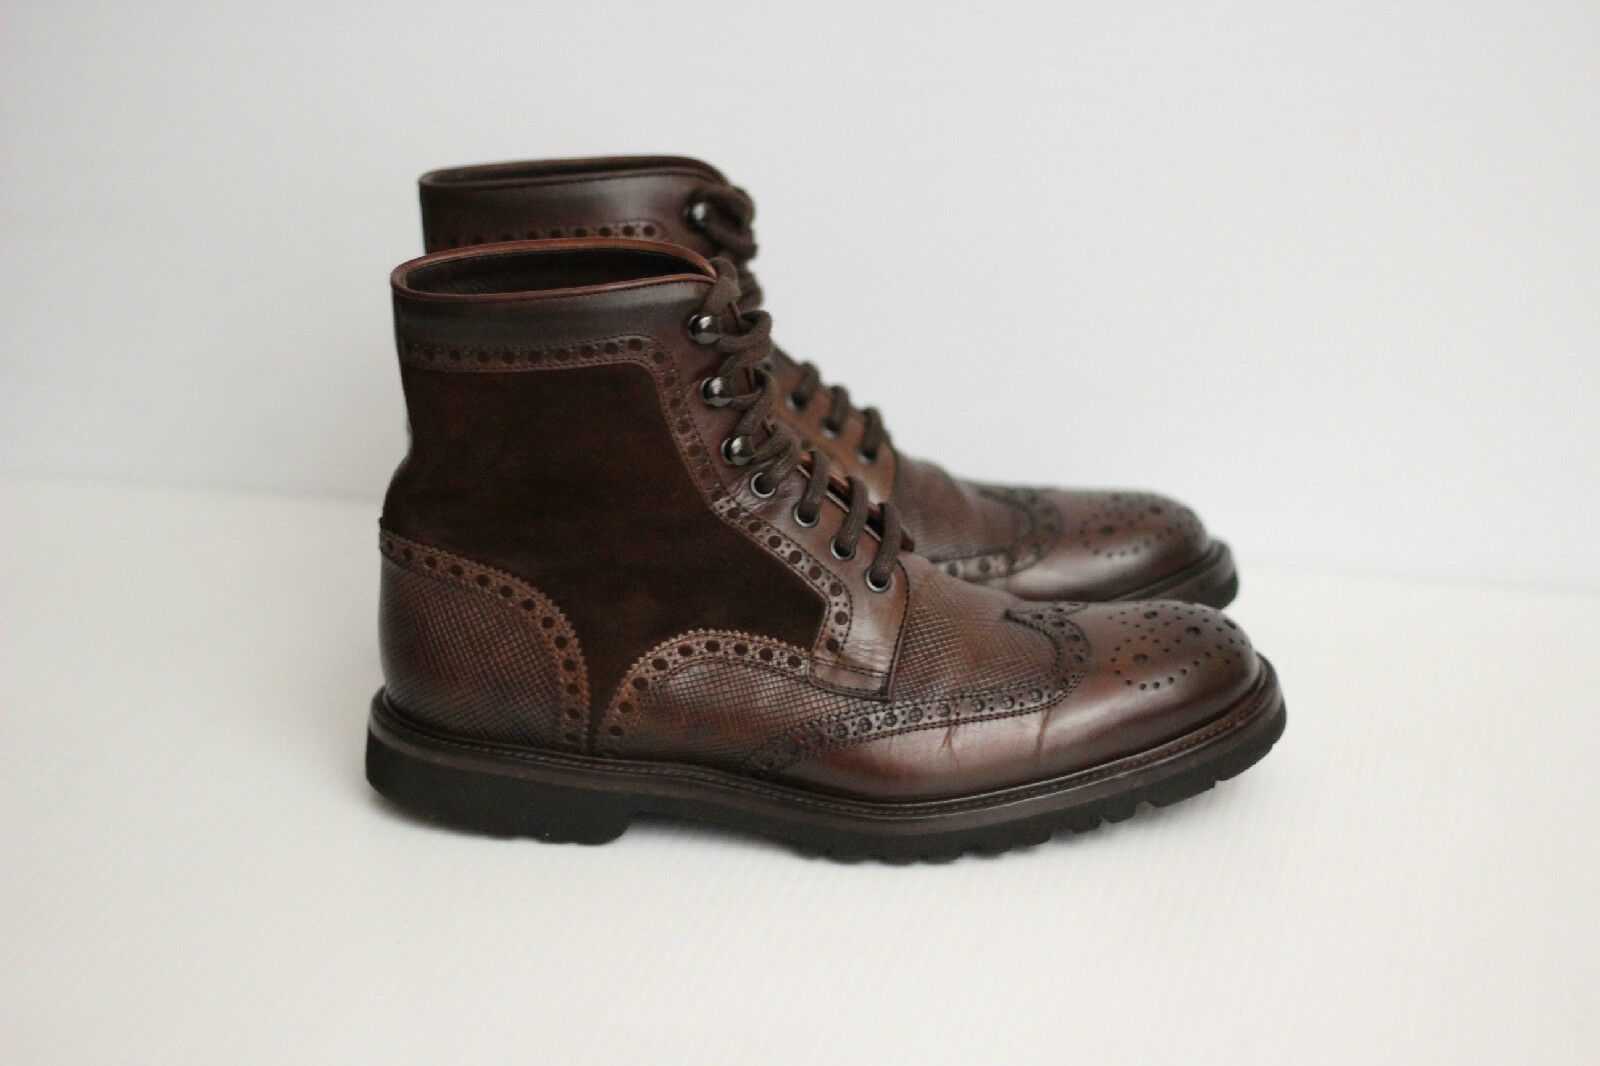 Magnanni 'Enzo' Wingtip Boot - Brown Pelle - 7.5 M - 15213  (C51)